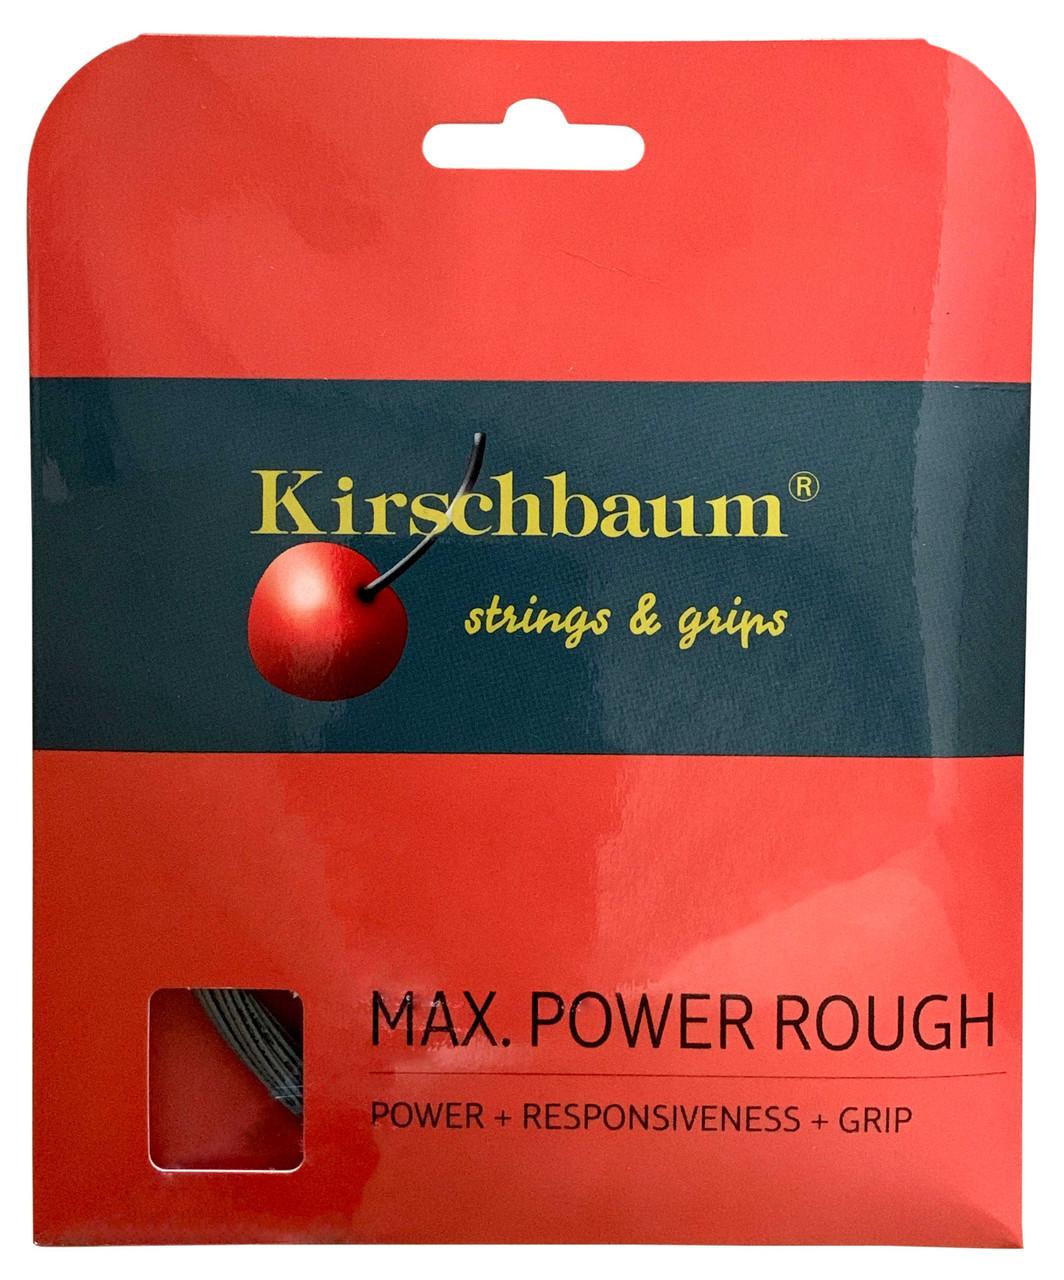 Kirschbaum Max Power Rough 17 1.25mm Tennis Strings Set